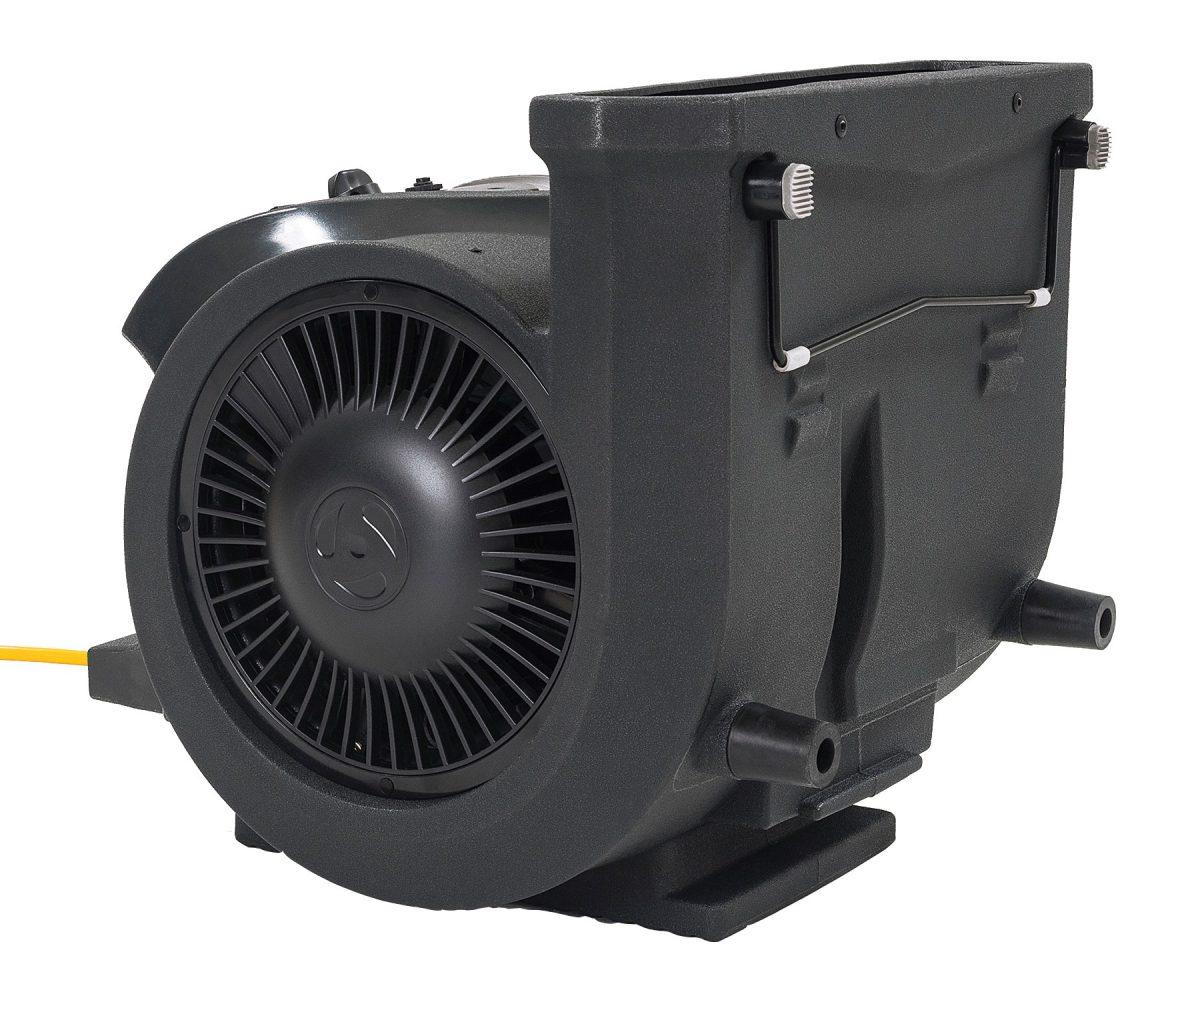 Clarke AM2400D Air Mover Carpet Dryer